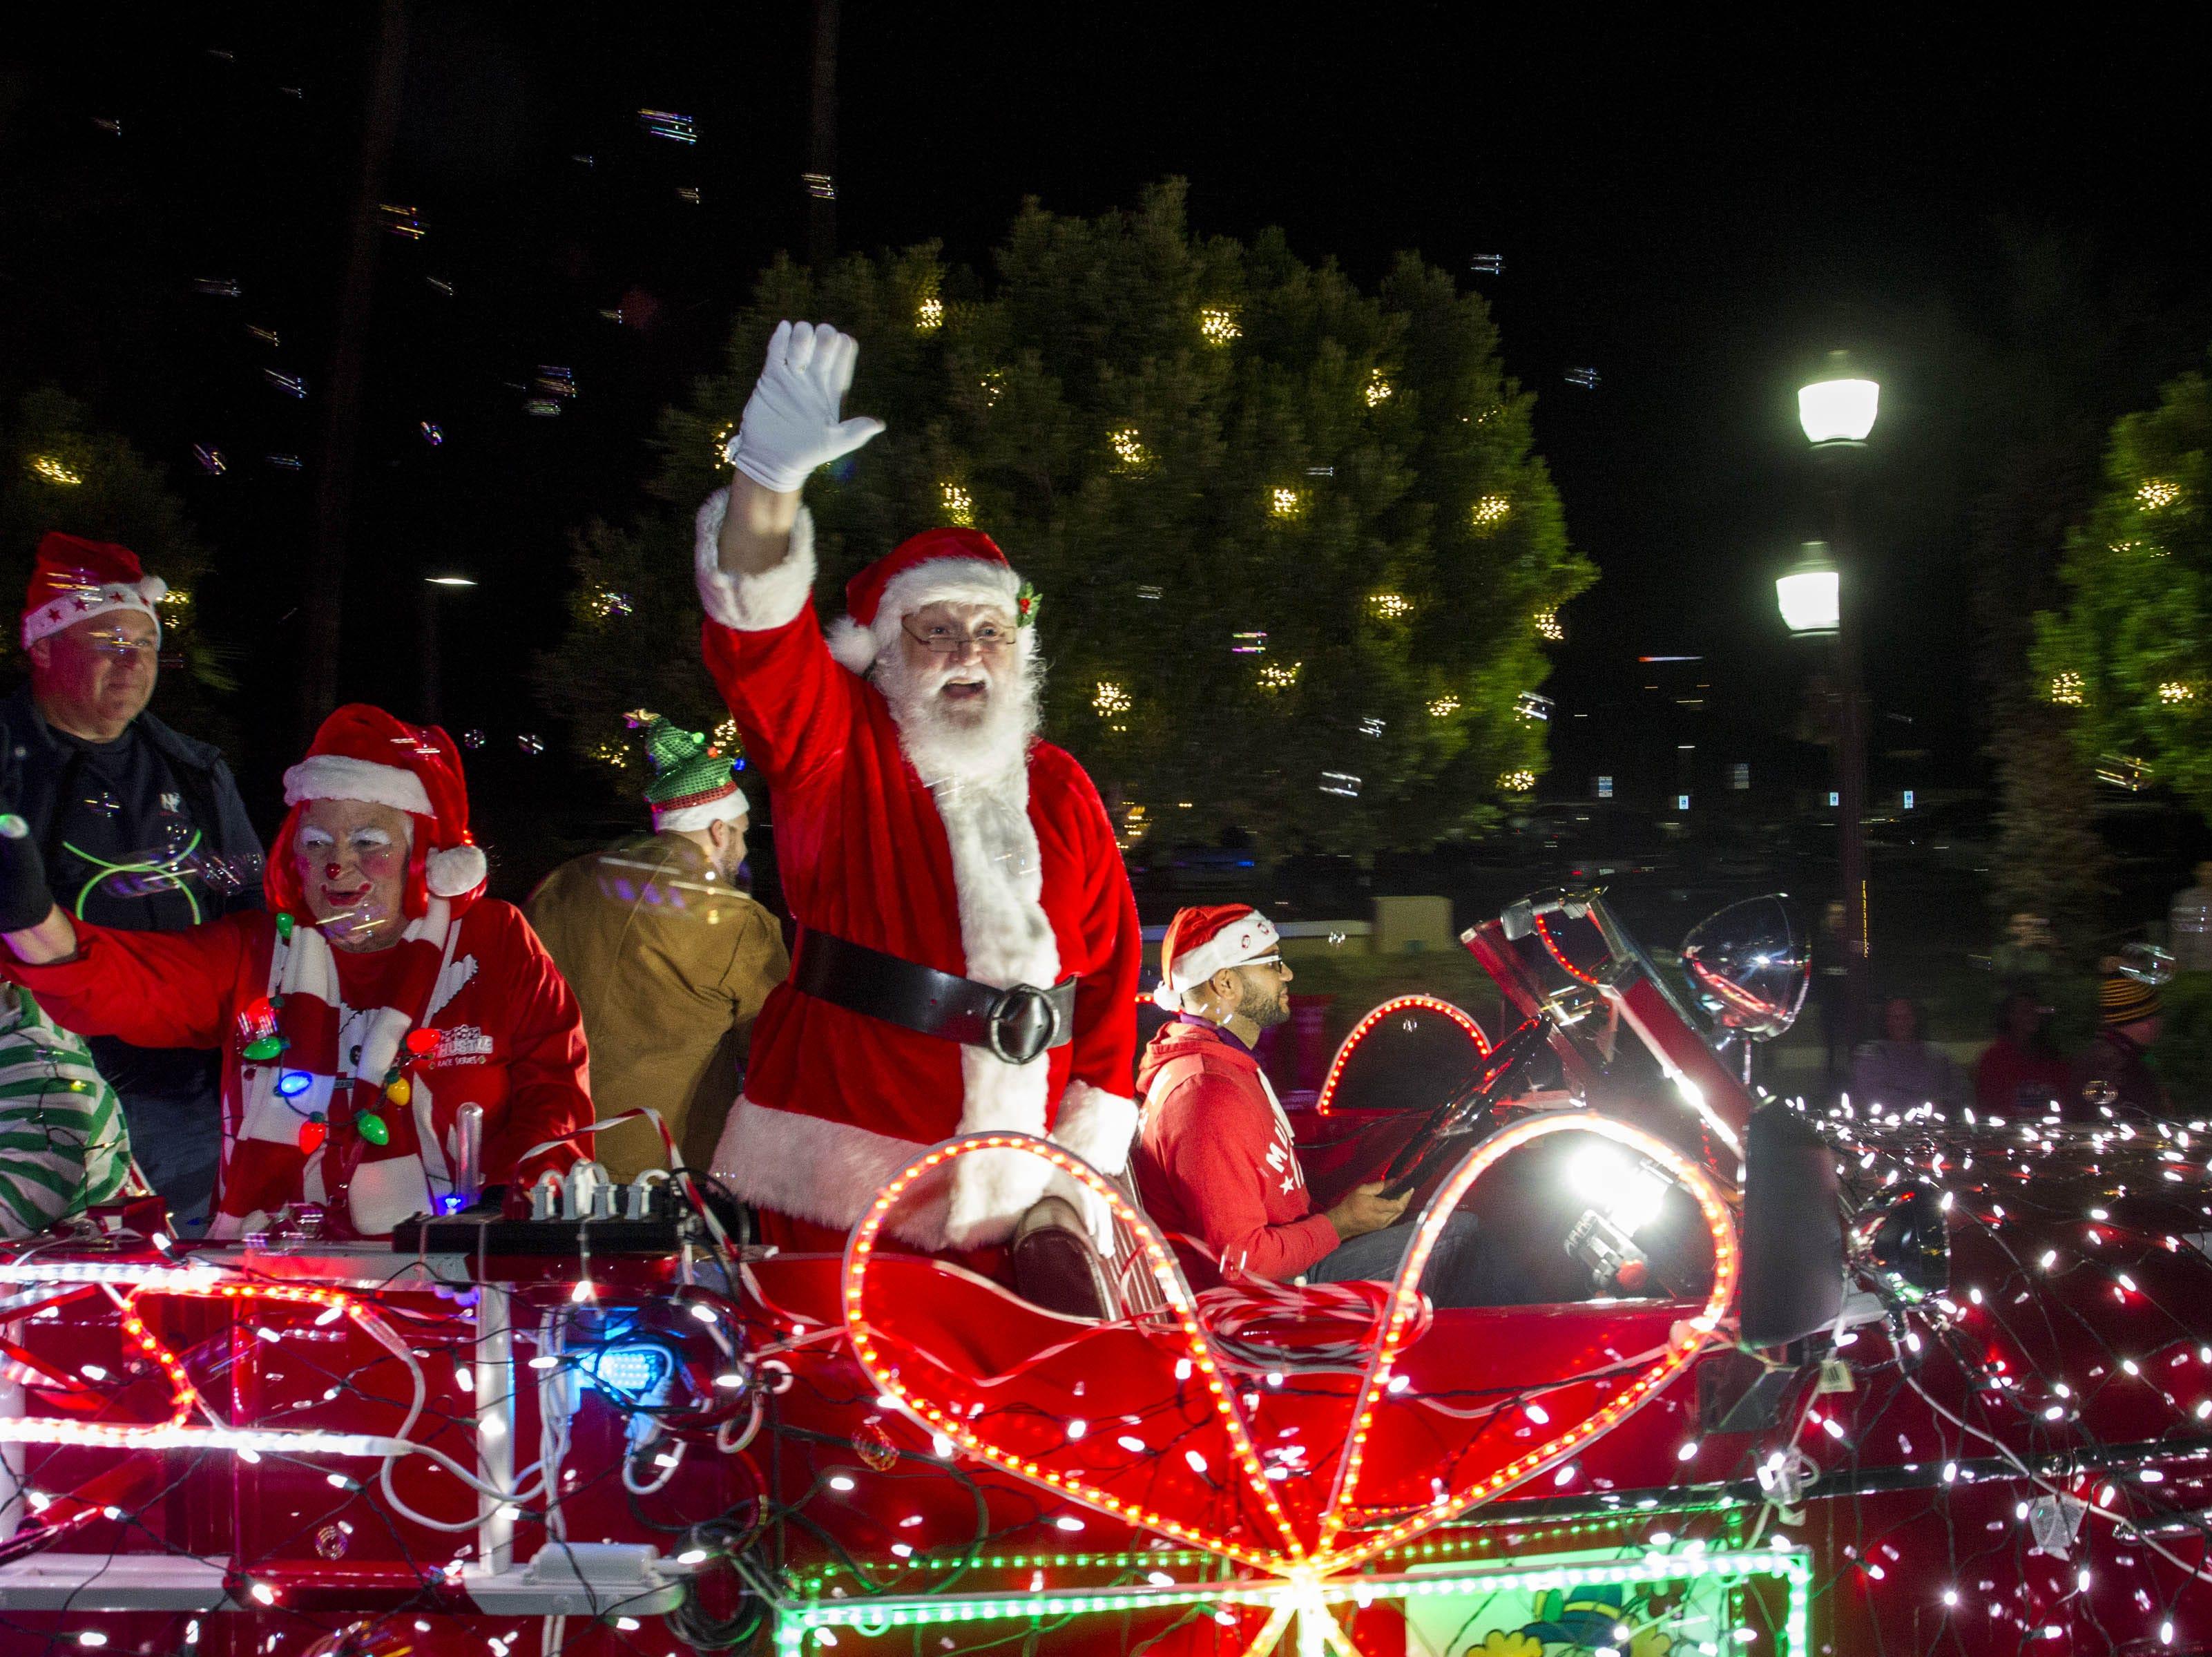 Santa Claus waves to kids along Mill Avenue during the 2018 Fantasy of Lights Parade, Friday Nov. 23, 2018.